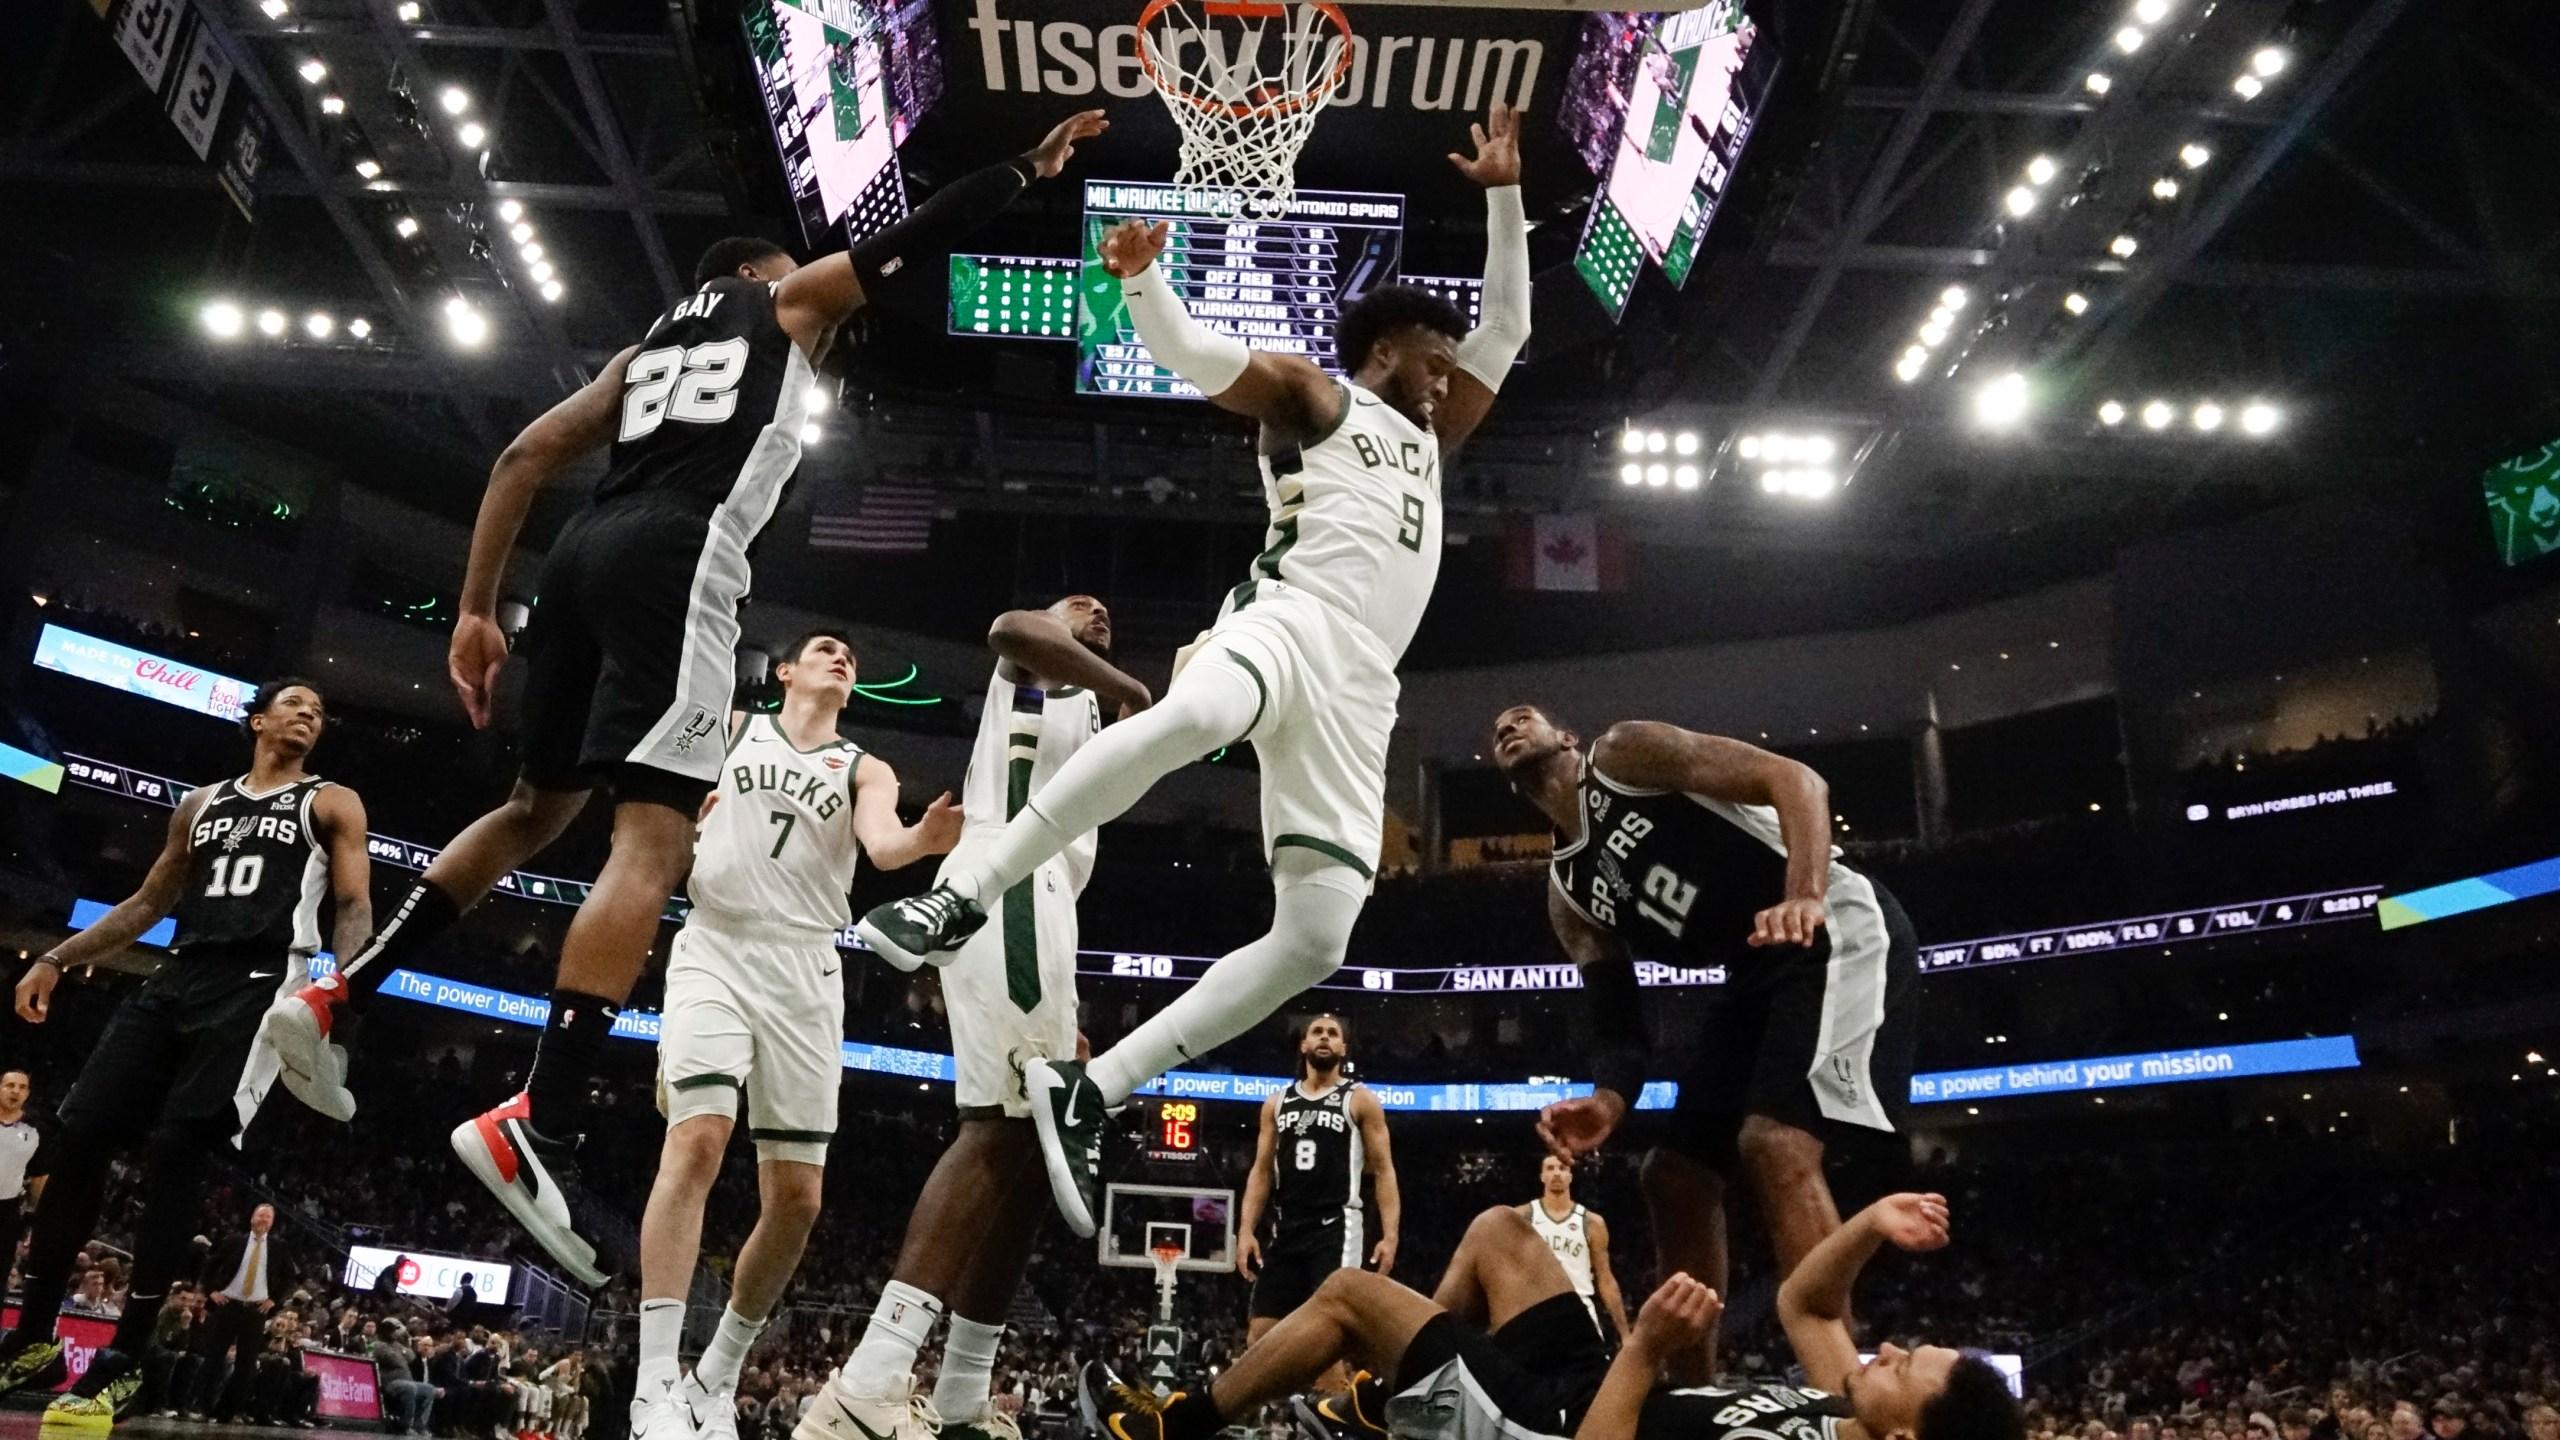 Nba Leading Bucks Beat Spurs 127 118 For 5th Straight Win Ksnt News